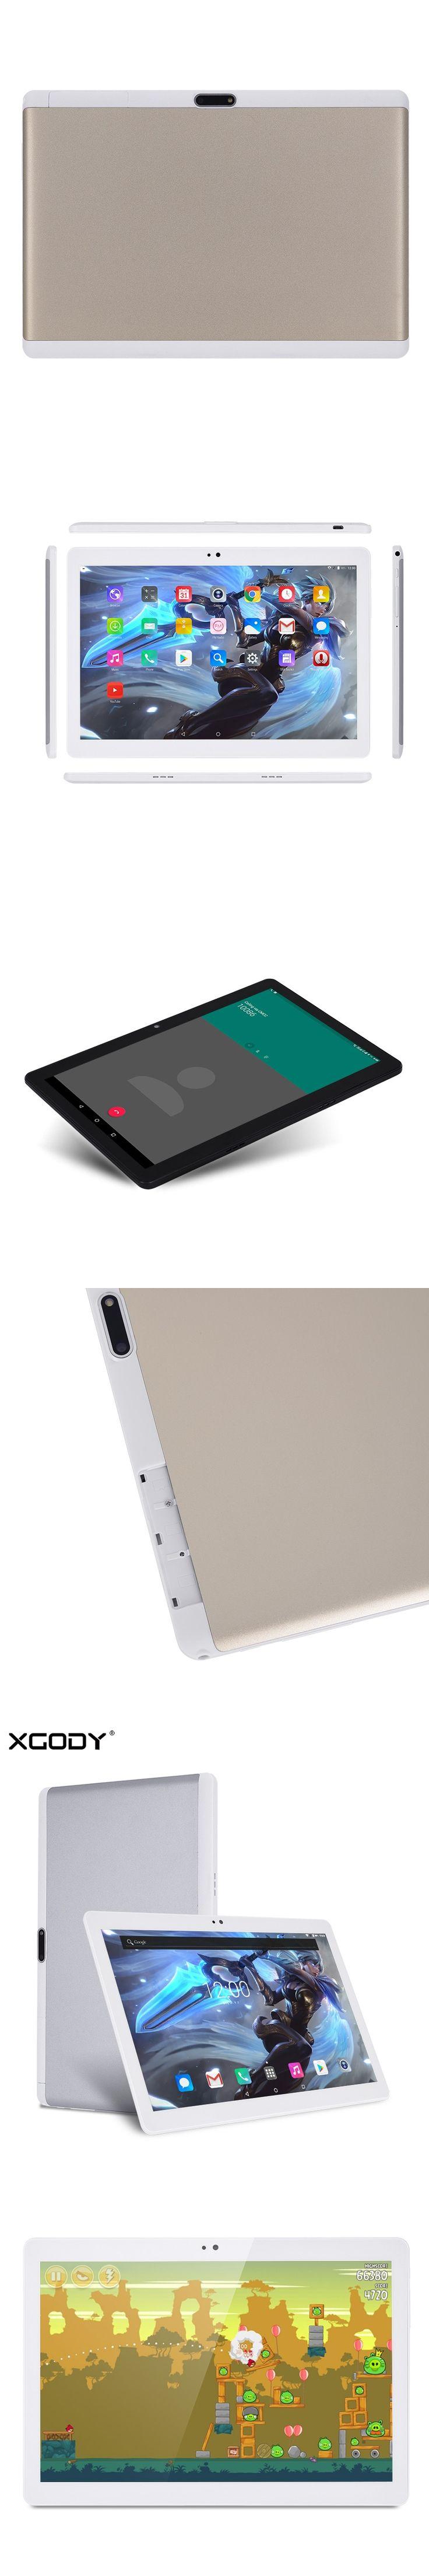 Origional XGODY Y107 4G LTE 10 Inch Tablet PC Android 7.0 MTK MT6753 Octa Core 2G RAM 32G ROM 1920*1200 IPS Tablets OTG Dual Sim